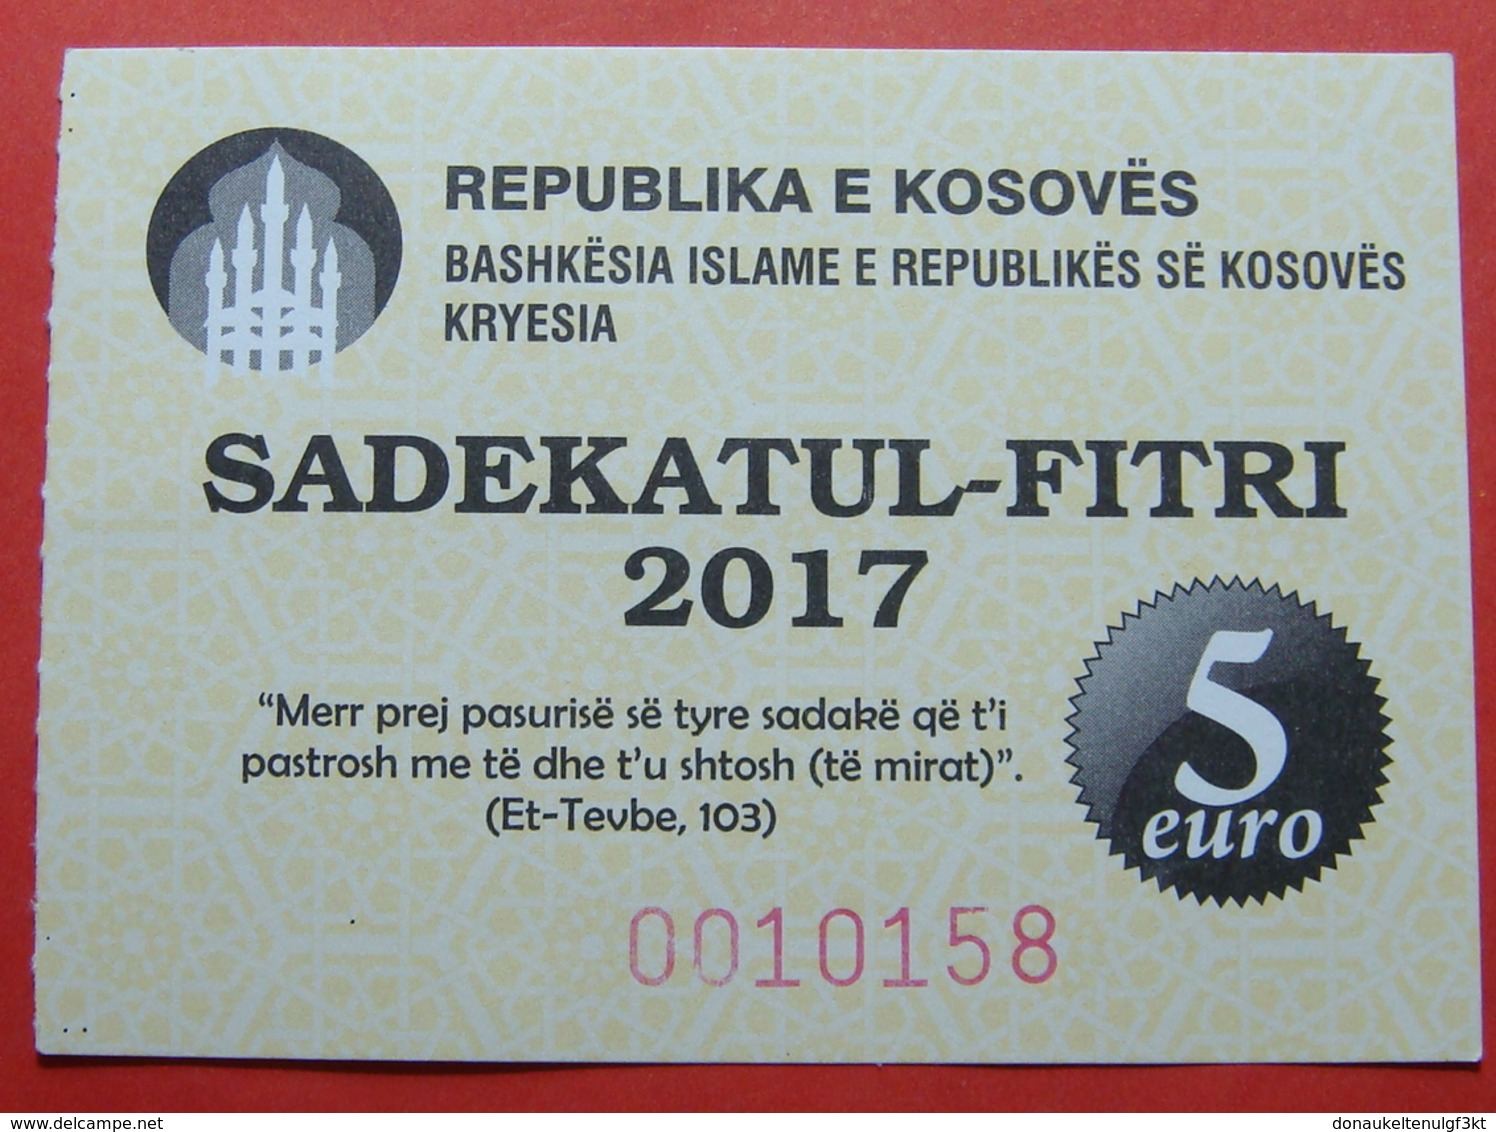 US PROTECTORATE, ISLAMIC STATE OF KOSOVO, 5 EURO 2017 SADAKA RAMADAN BON - Etats-Unis